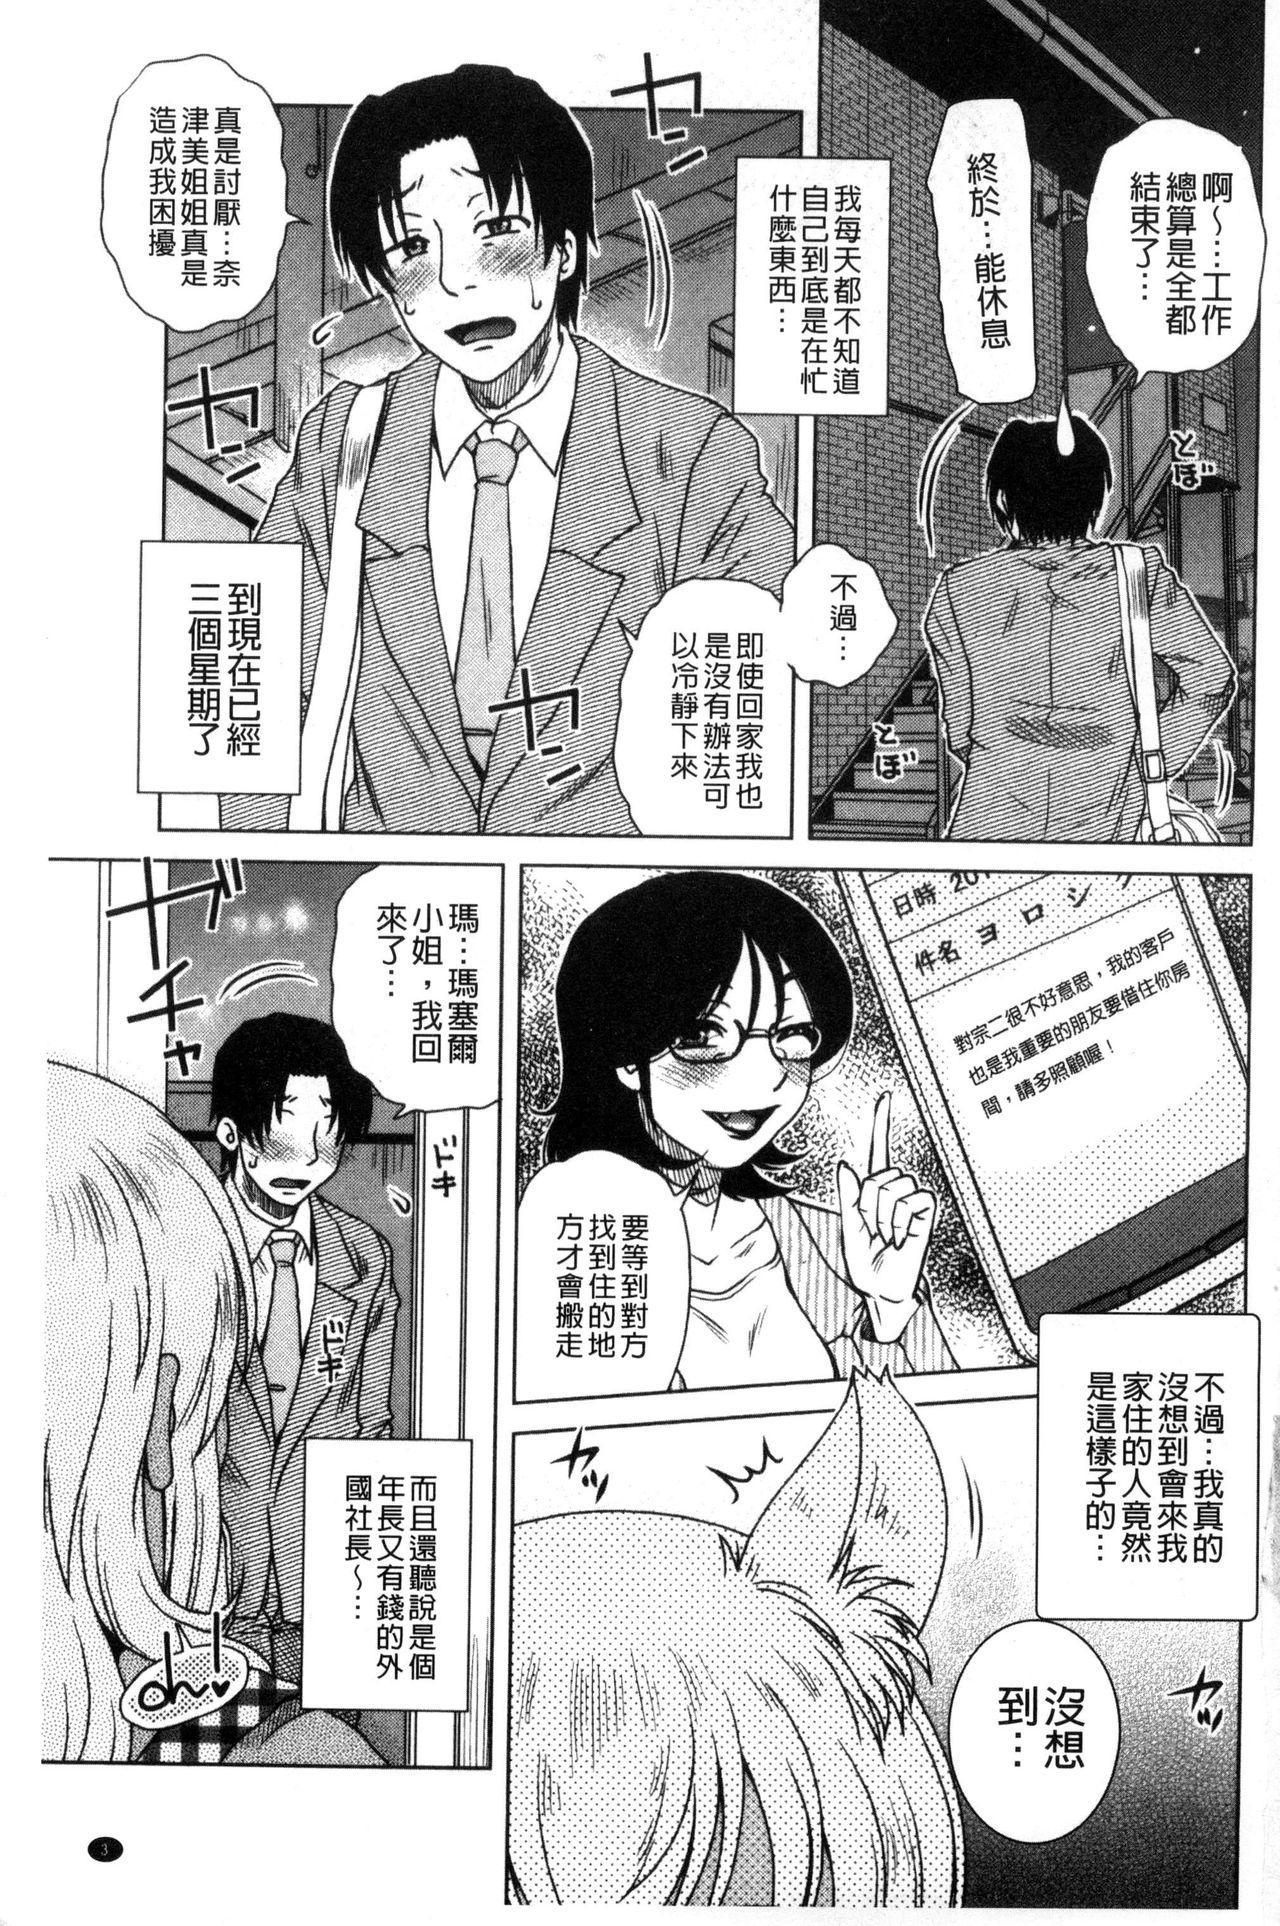 [Kurumiya Mashimin] Uchi no Shachou no Hamedere Inkatsu - Our President is HAME-DERE in Licentious sex life. [Chinese] 7